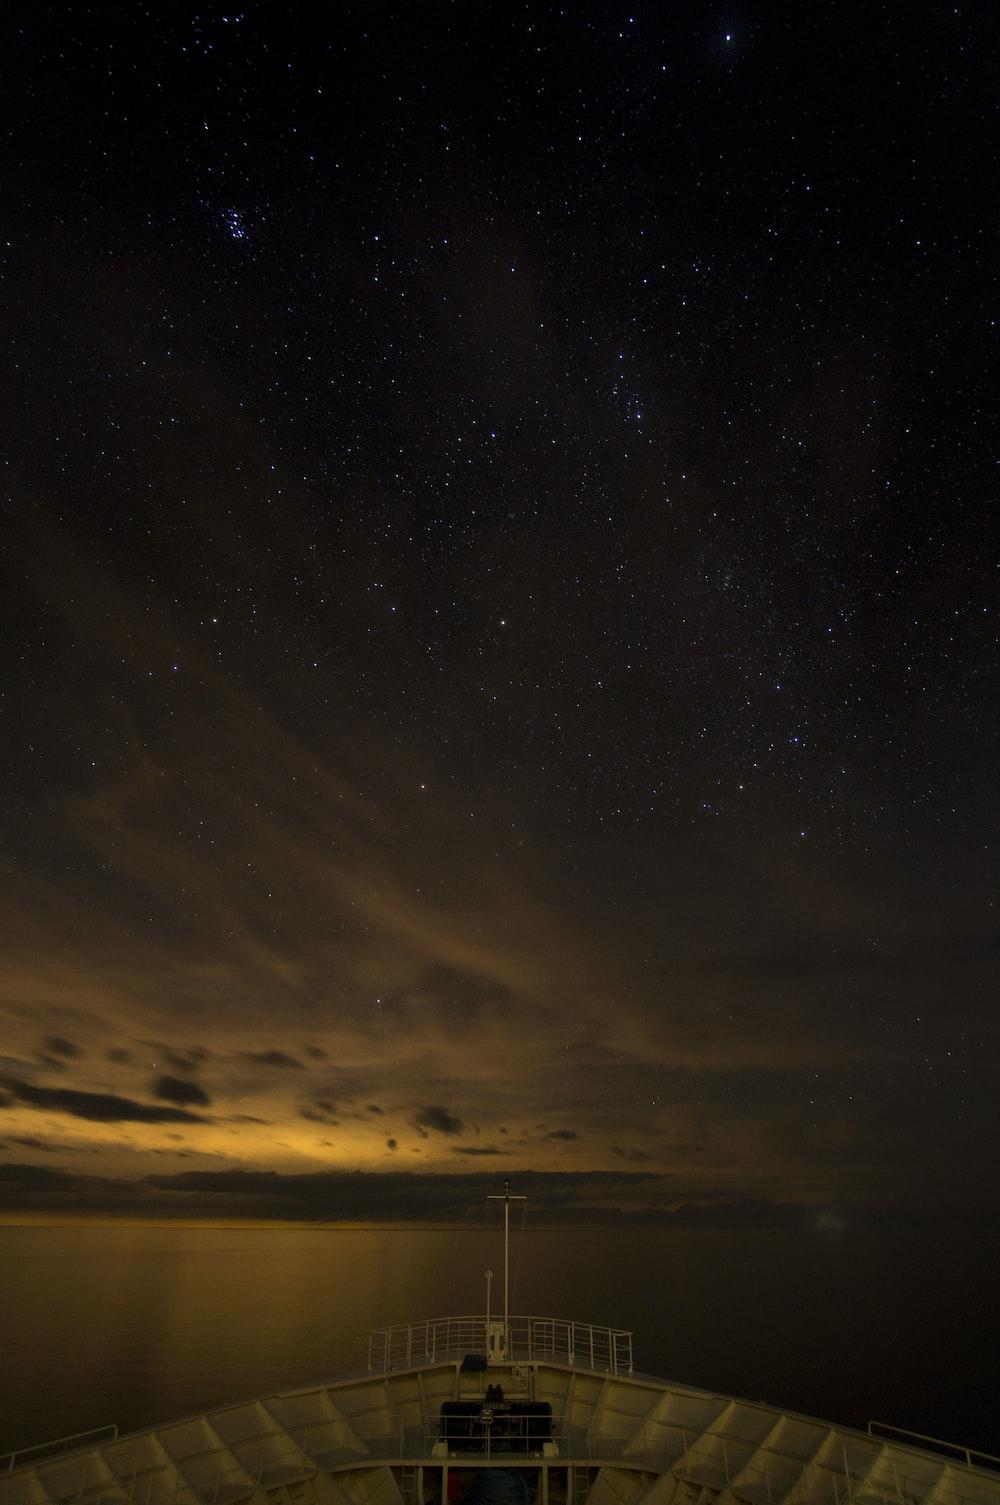 body of water under starry sky